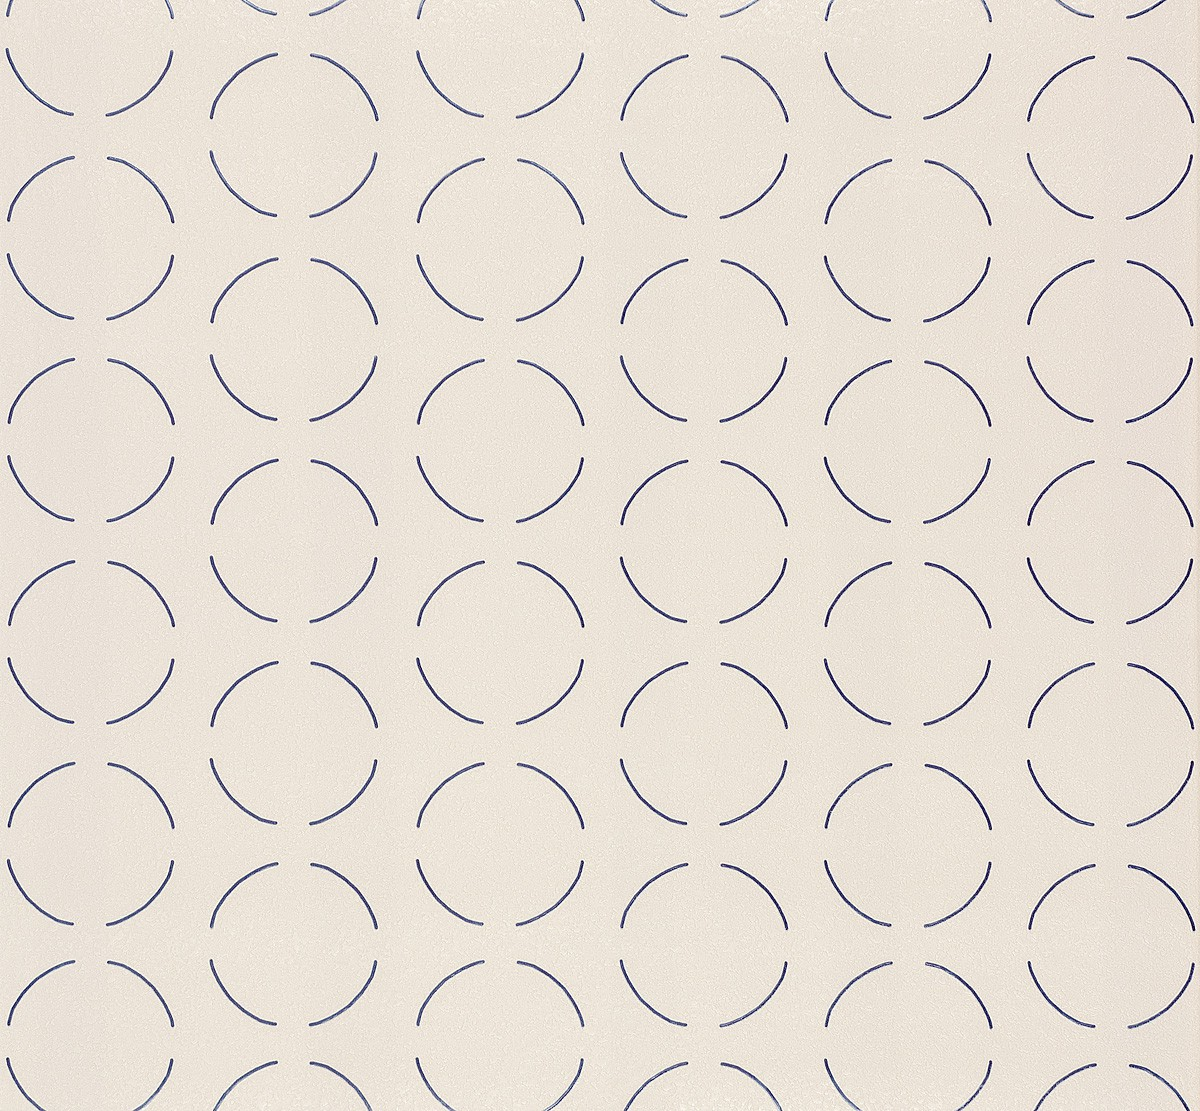 Porsche design tapete grau blau grafik 96064 3 for Design tapete grau